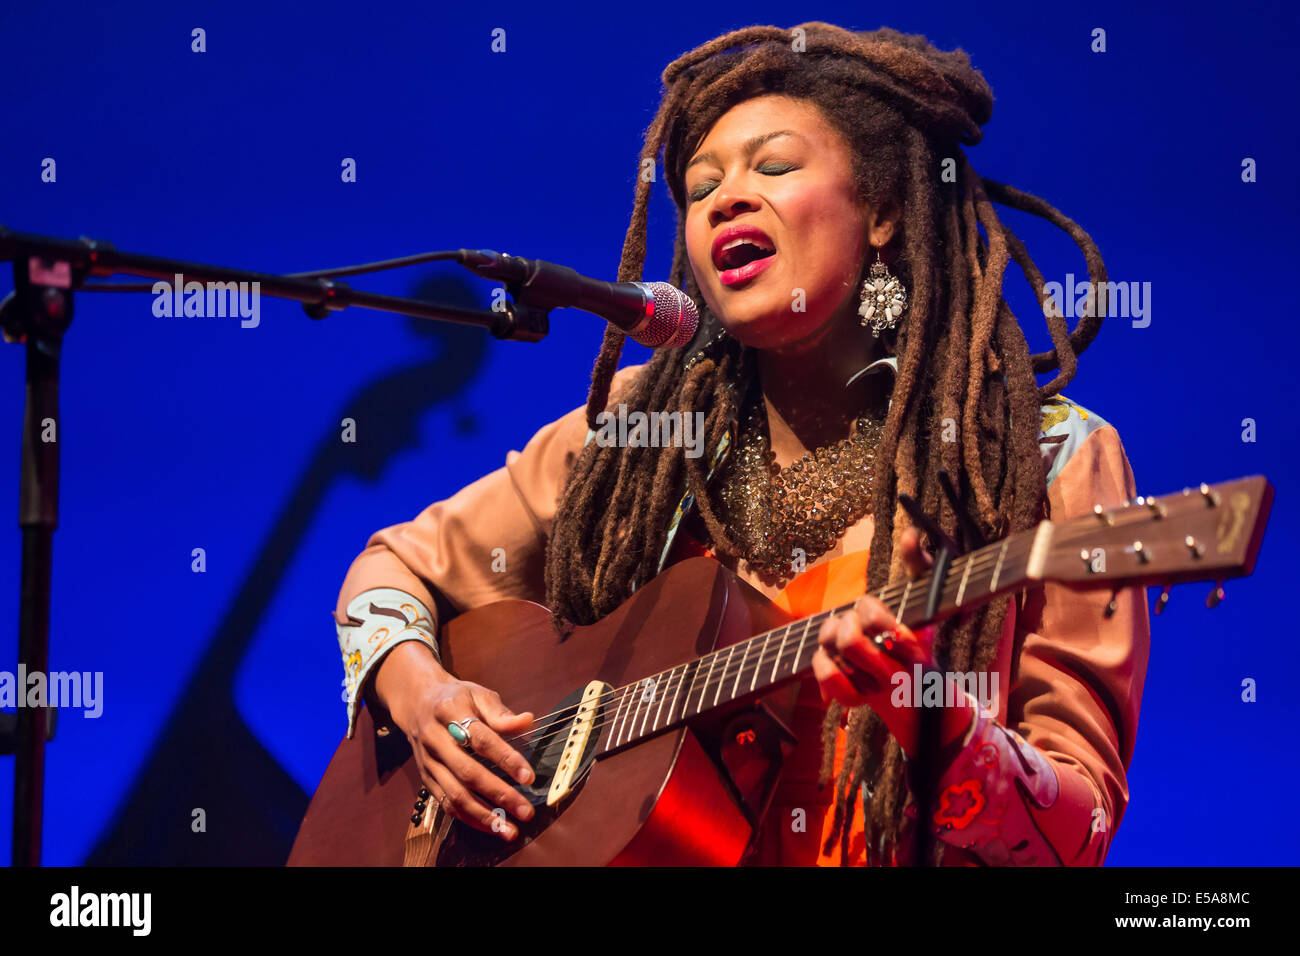 The American singer-songwriter Valerie June, performing live at the Blue Balls Festival, Lucerne, Switzerland - Stock Image